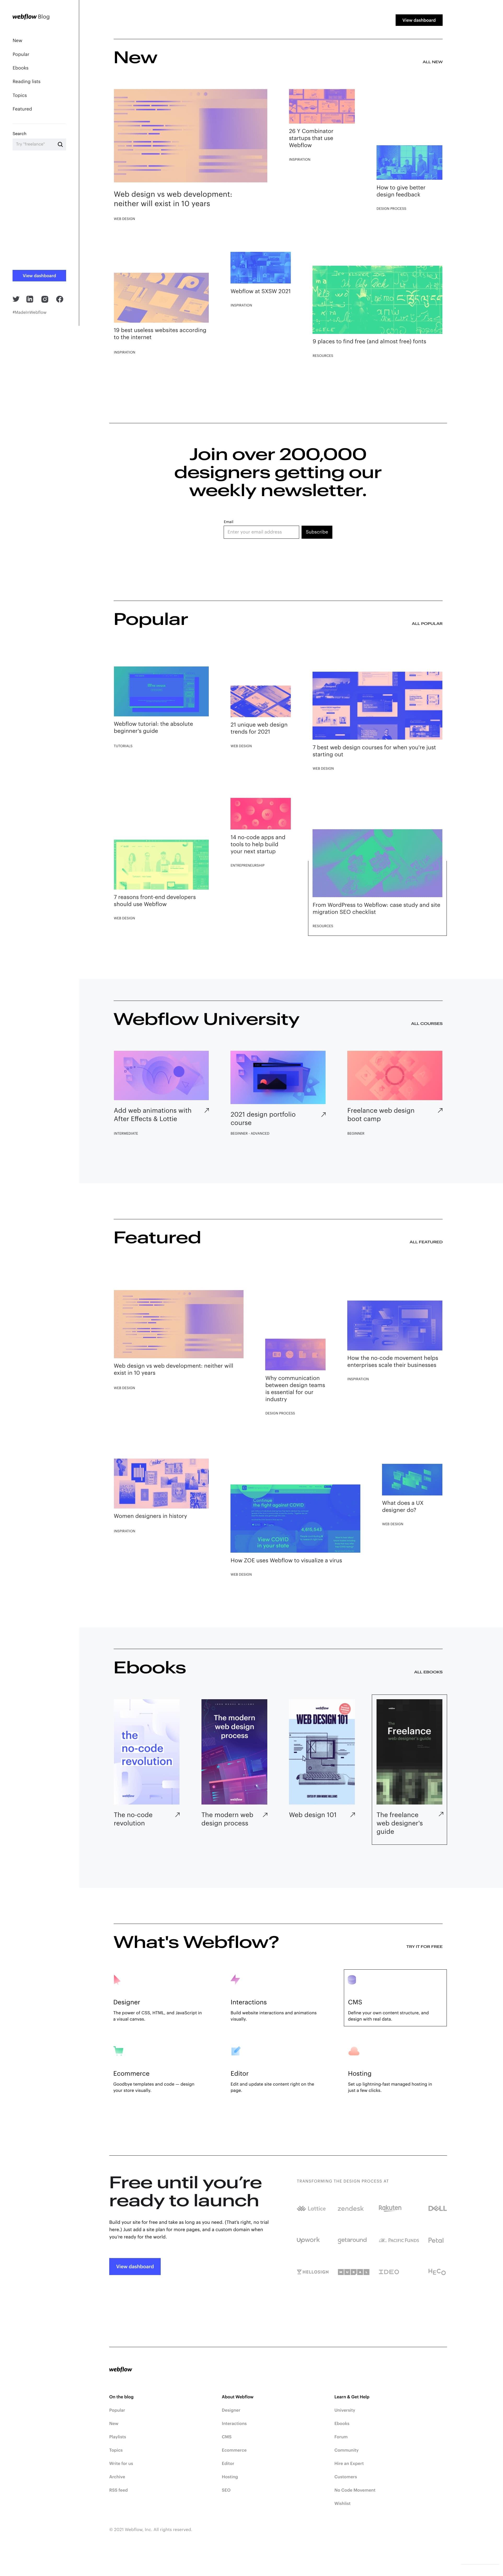 Webflow Blog homepage design